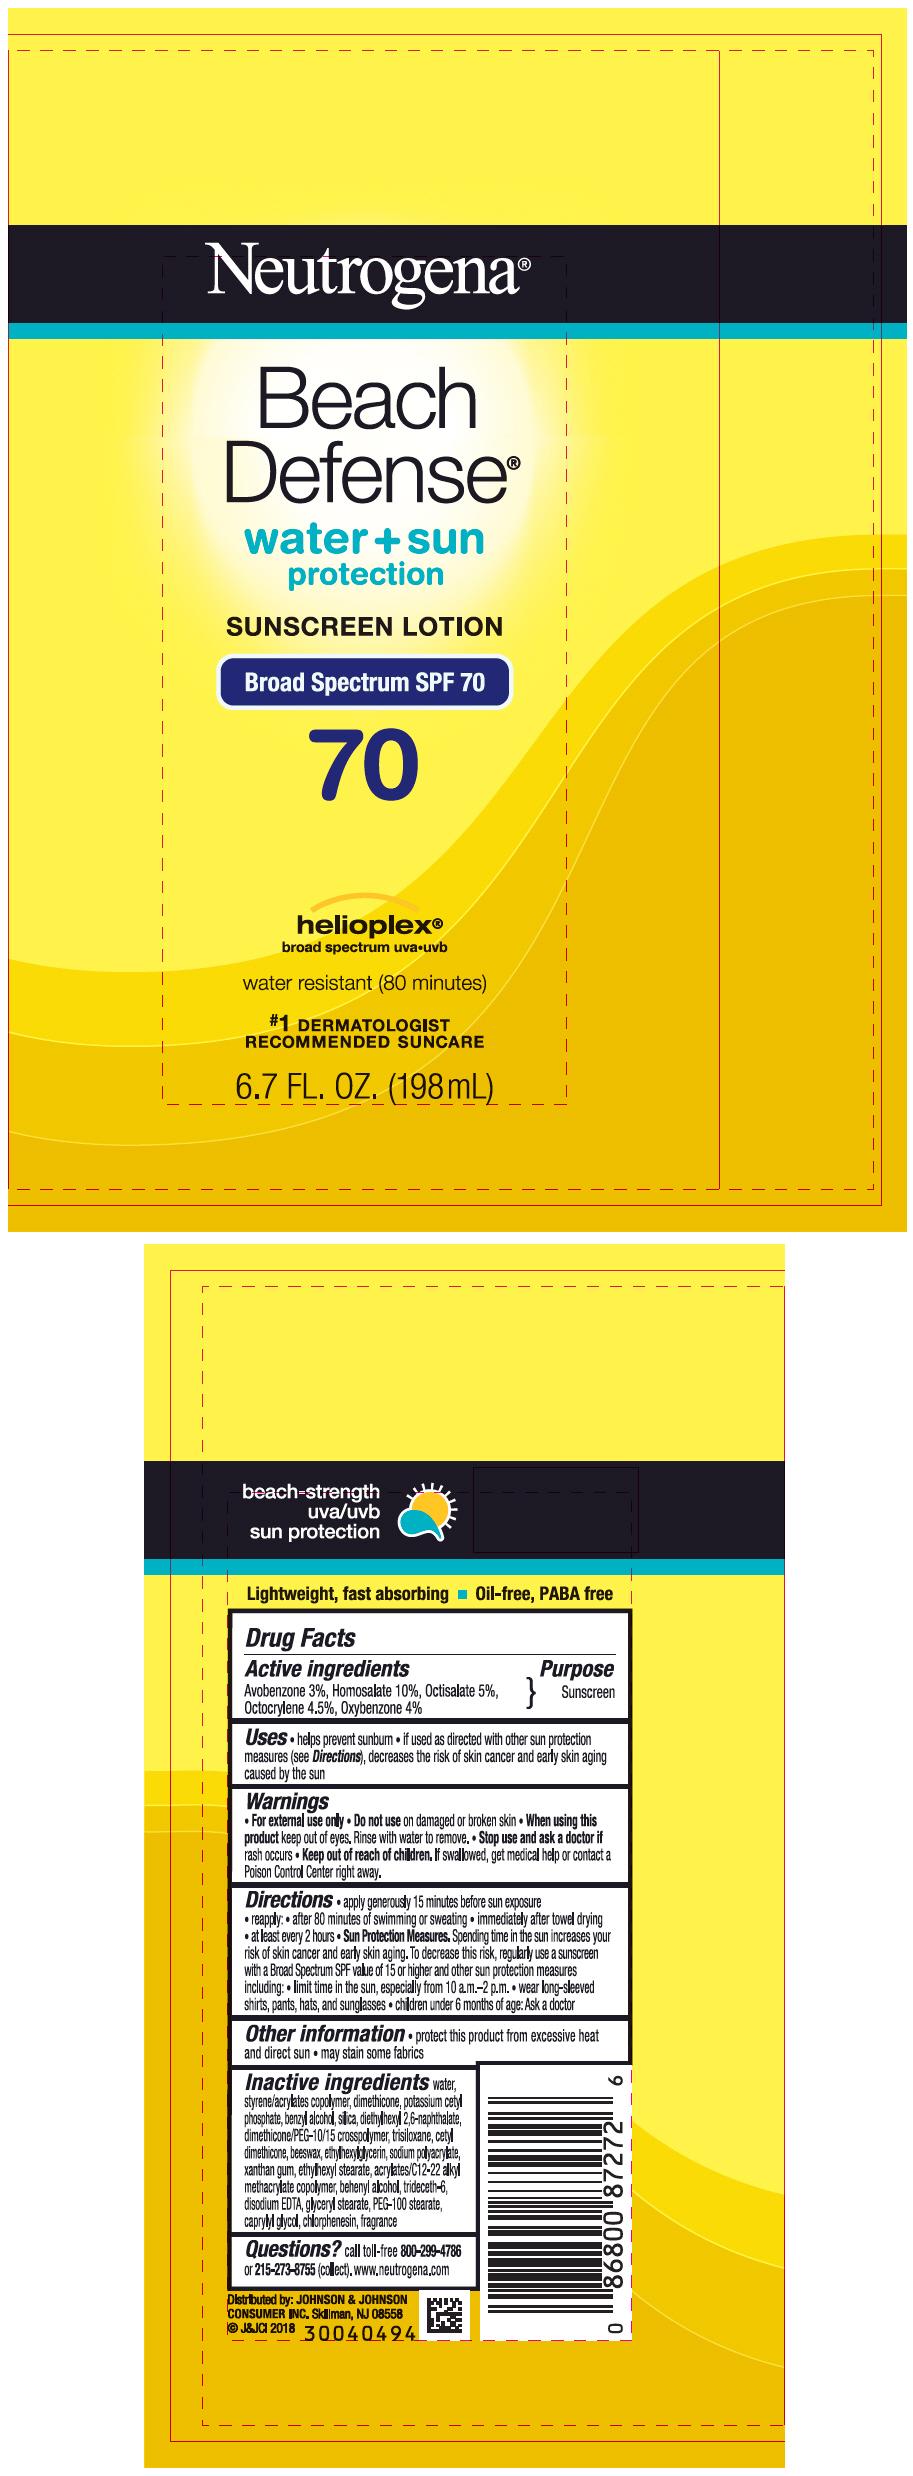 Avobenzone, Homosalate, Octisalate, Octocrylene, Oxybenzone - Sunscreen Broad Spectrum SPF70 (Neutrogena Beach Defense Water Plus Sun Protection)